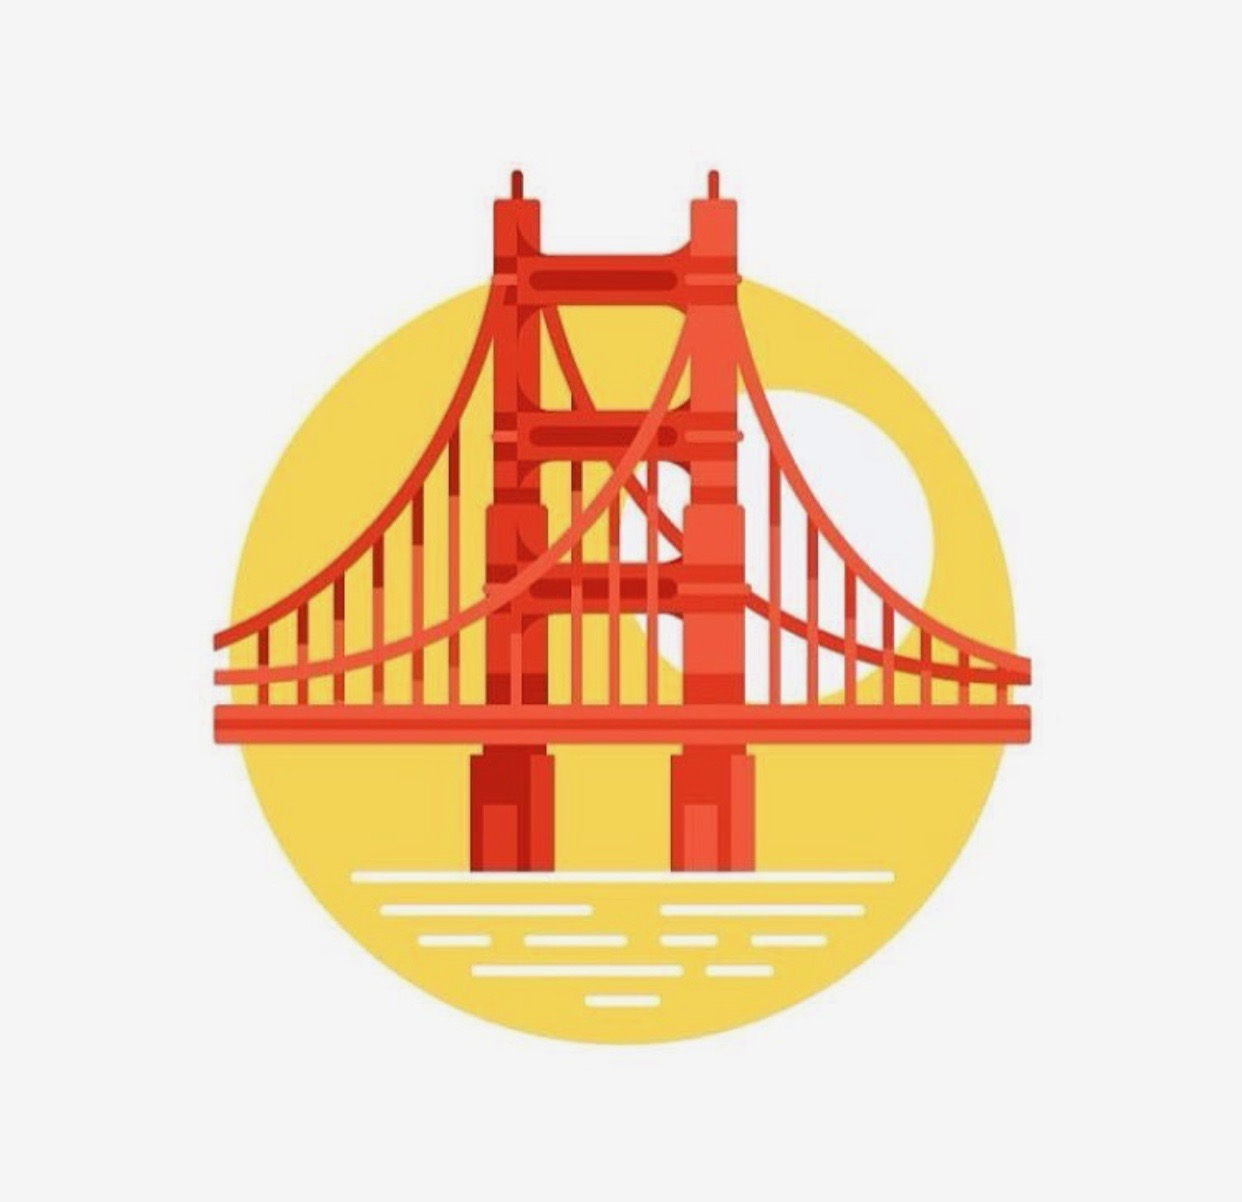 Brooklyn Bridge 2 animation by Kicks